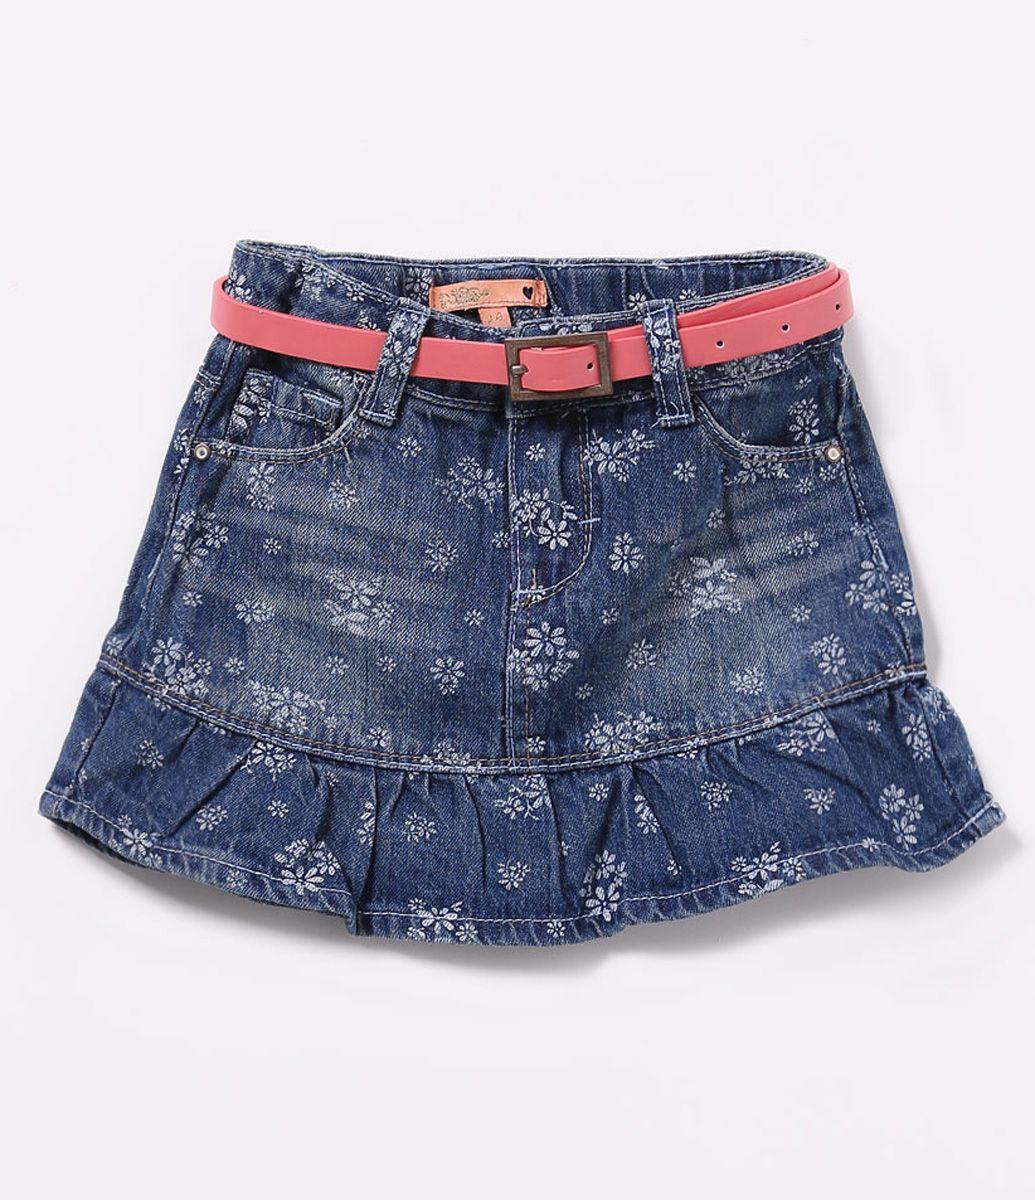 Vestido jeans infantil de babado